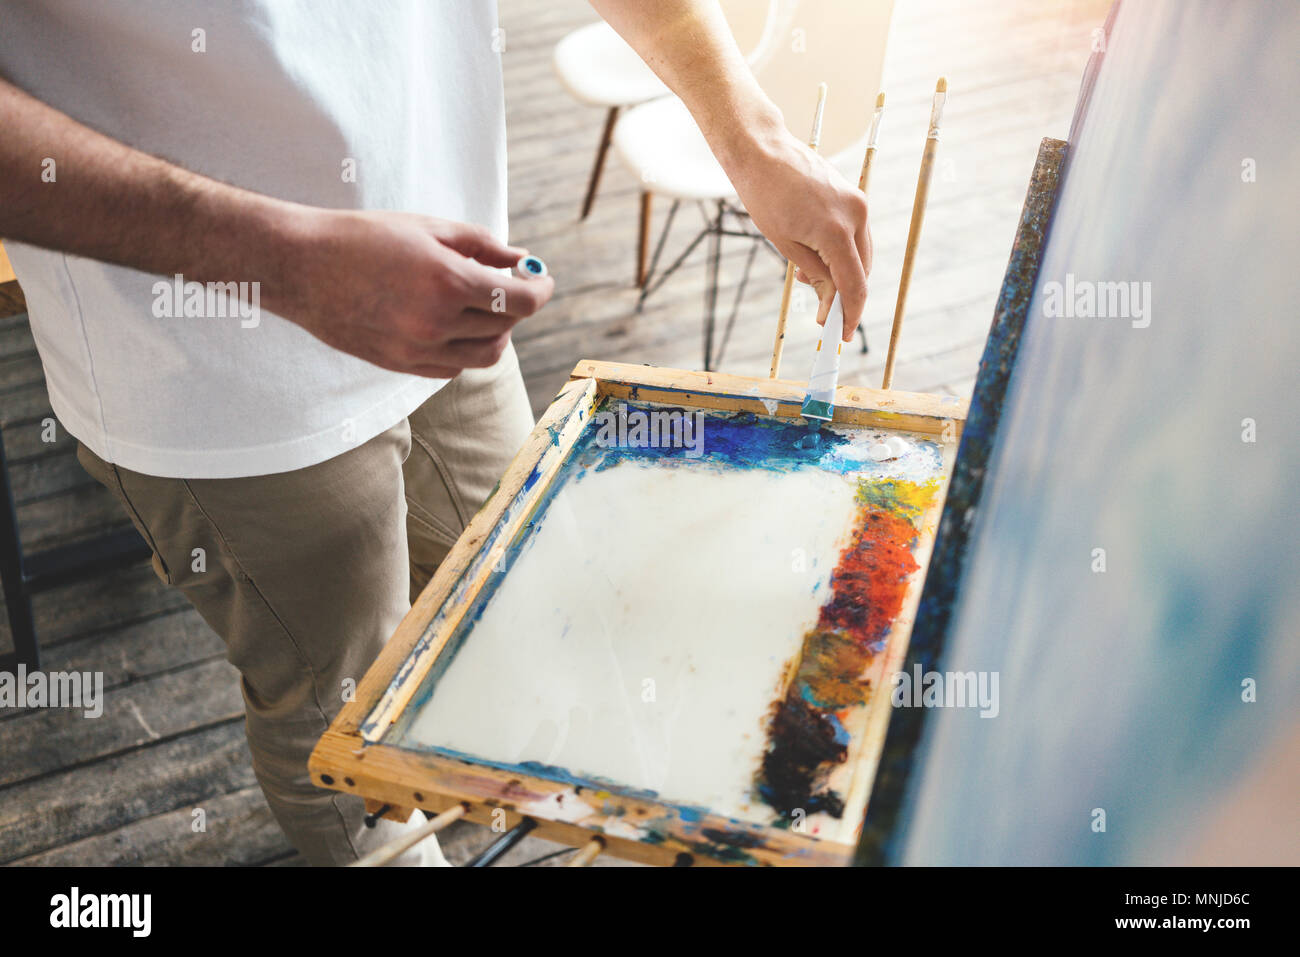 Painter mixes oil paint colors on the palette in workshop. Men artist in light studio. Lens flare effect - Stock Image